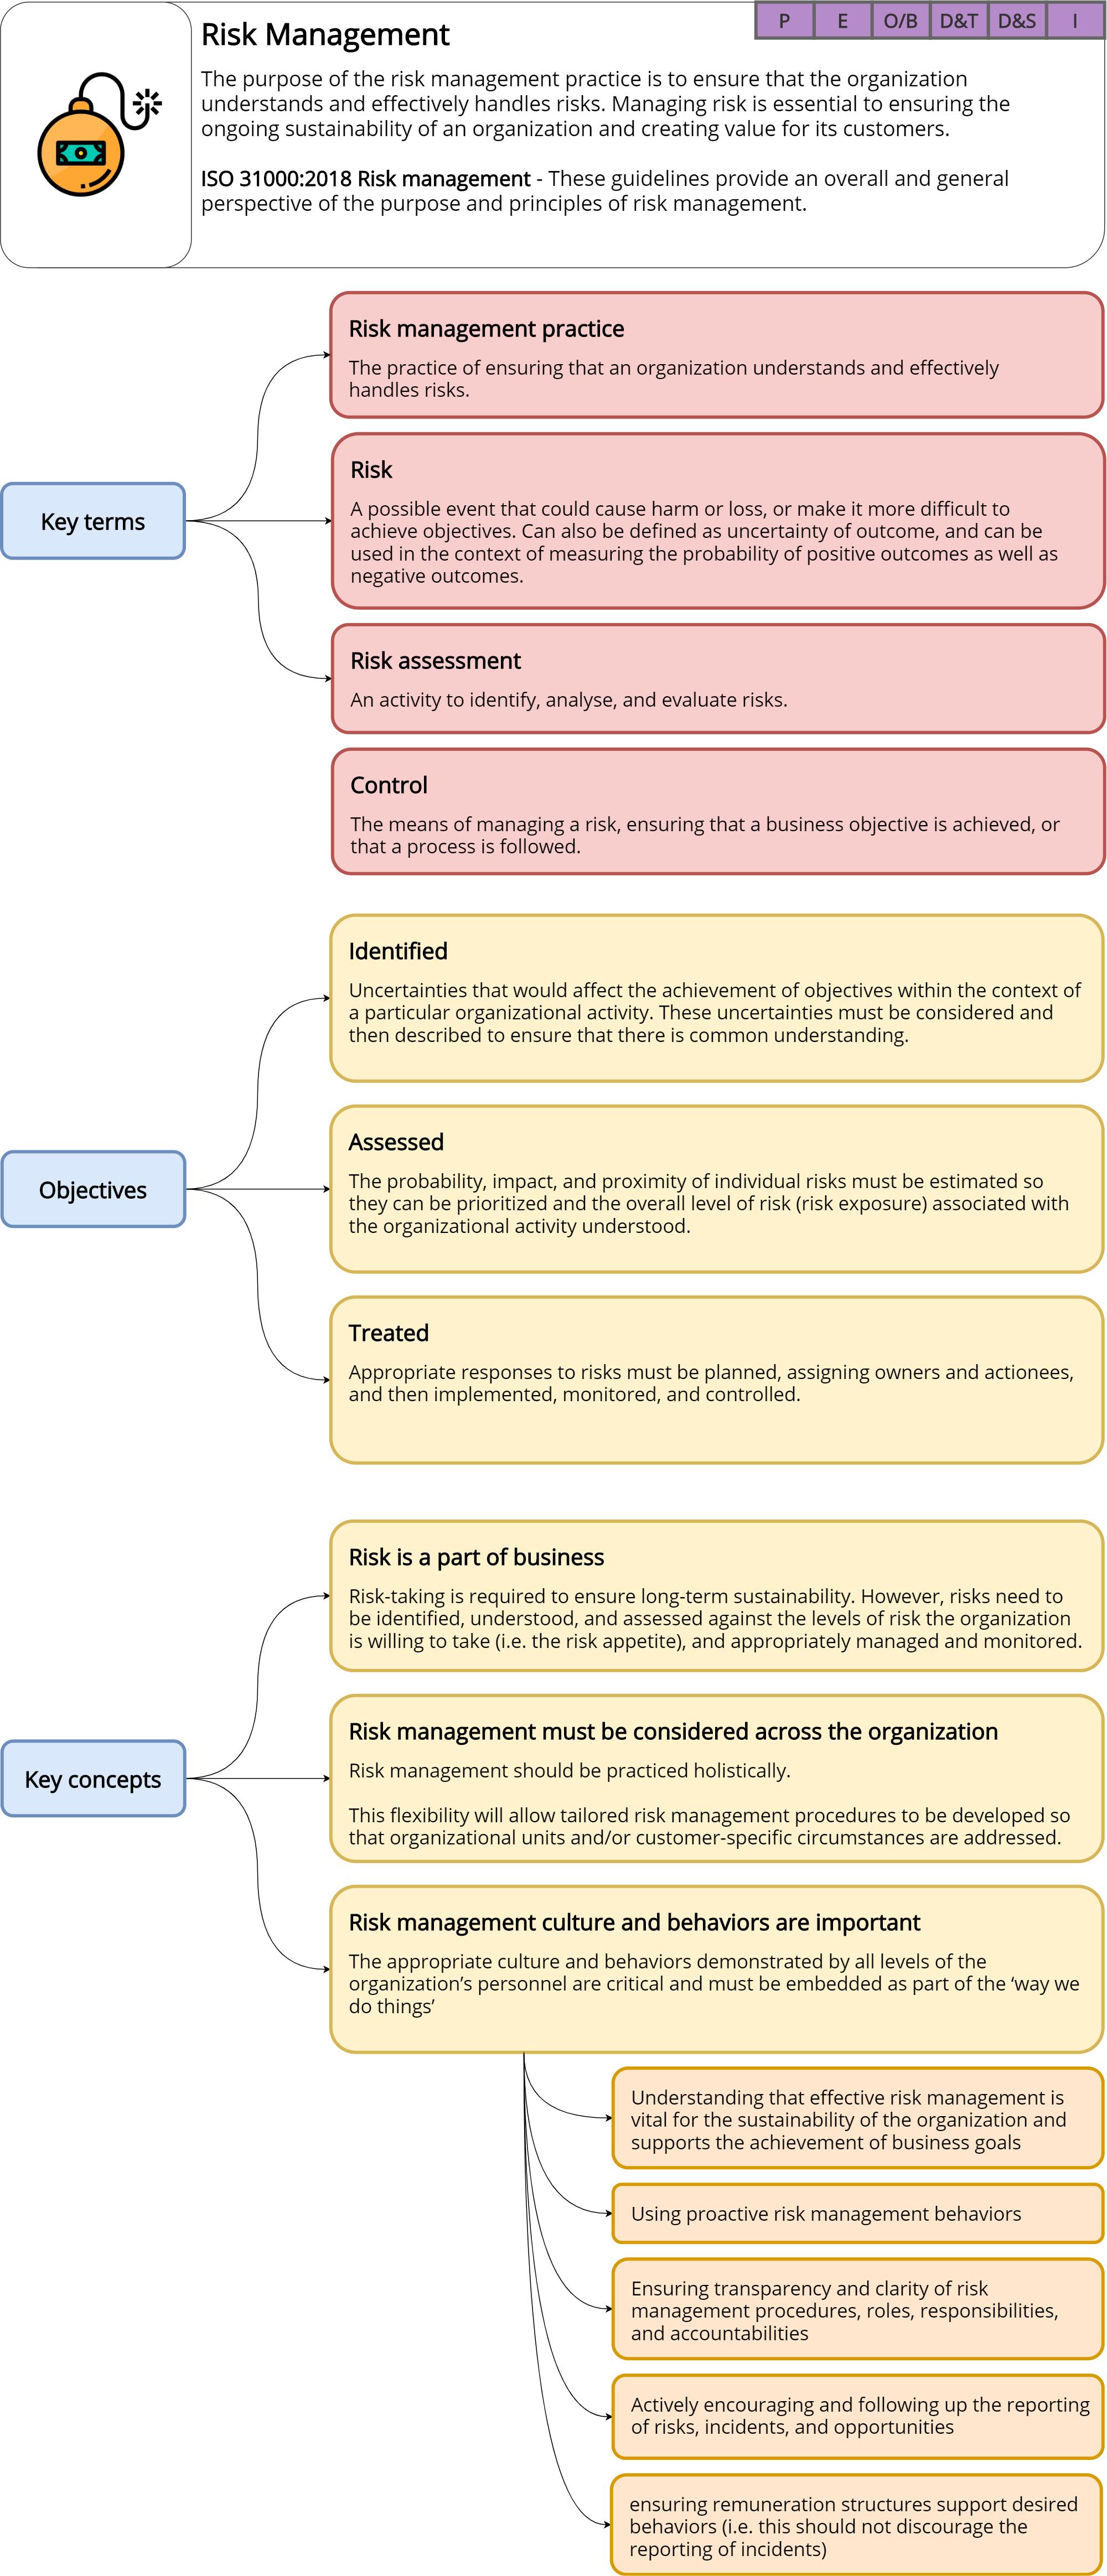 Risk management – ITILv4